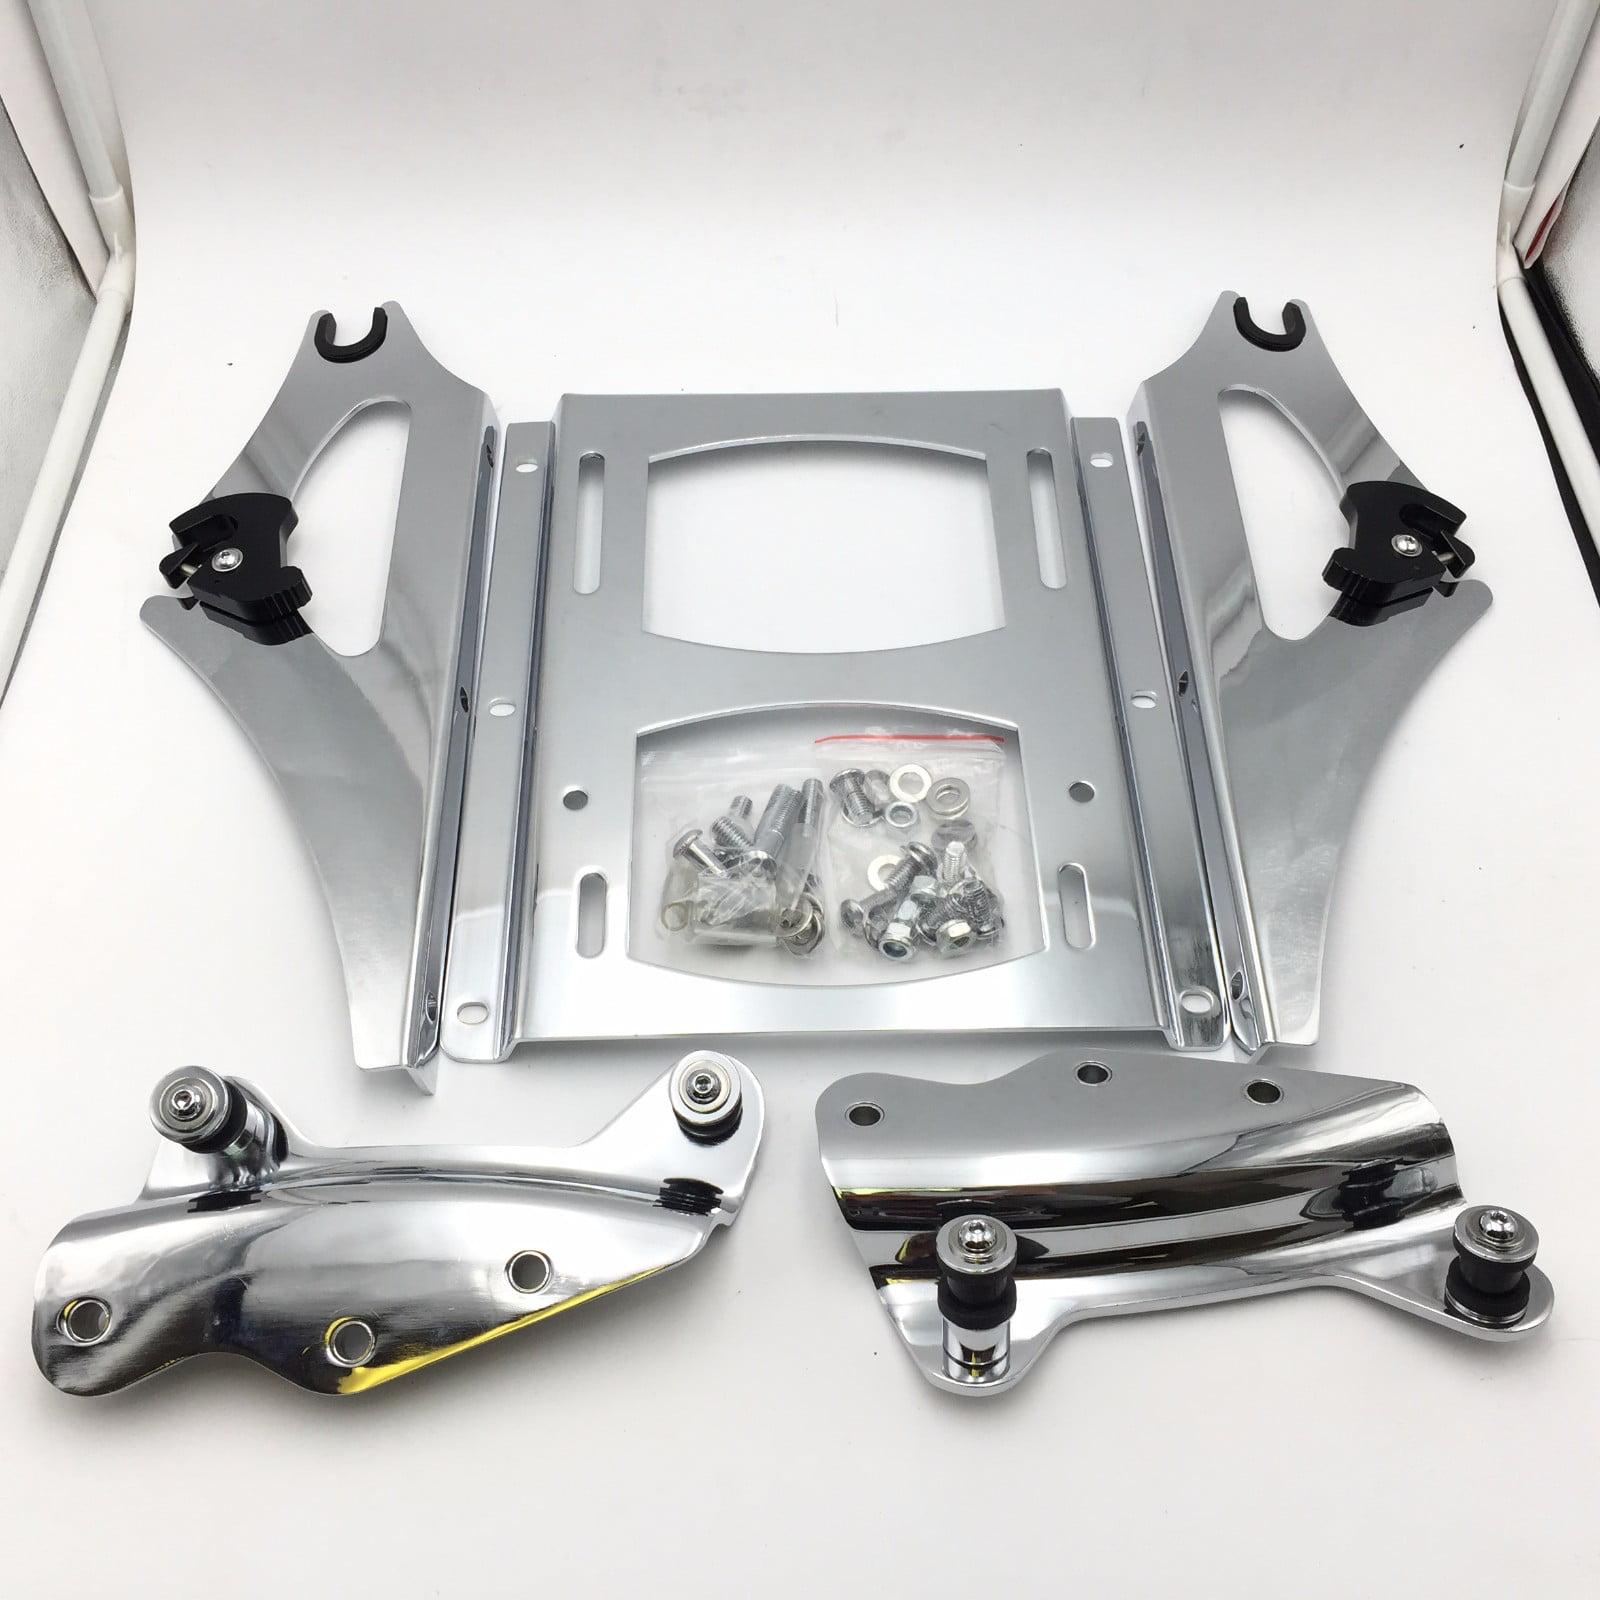 Chrome 4-Point Detachable Docking Hardware Kit for 2009-2013 Harley Davidson